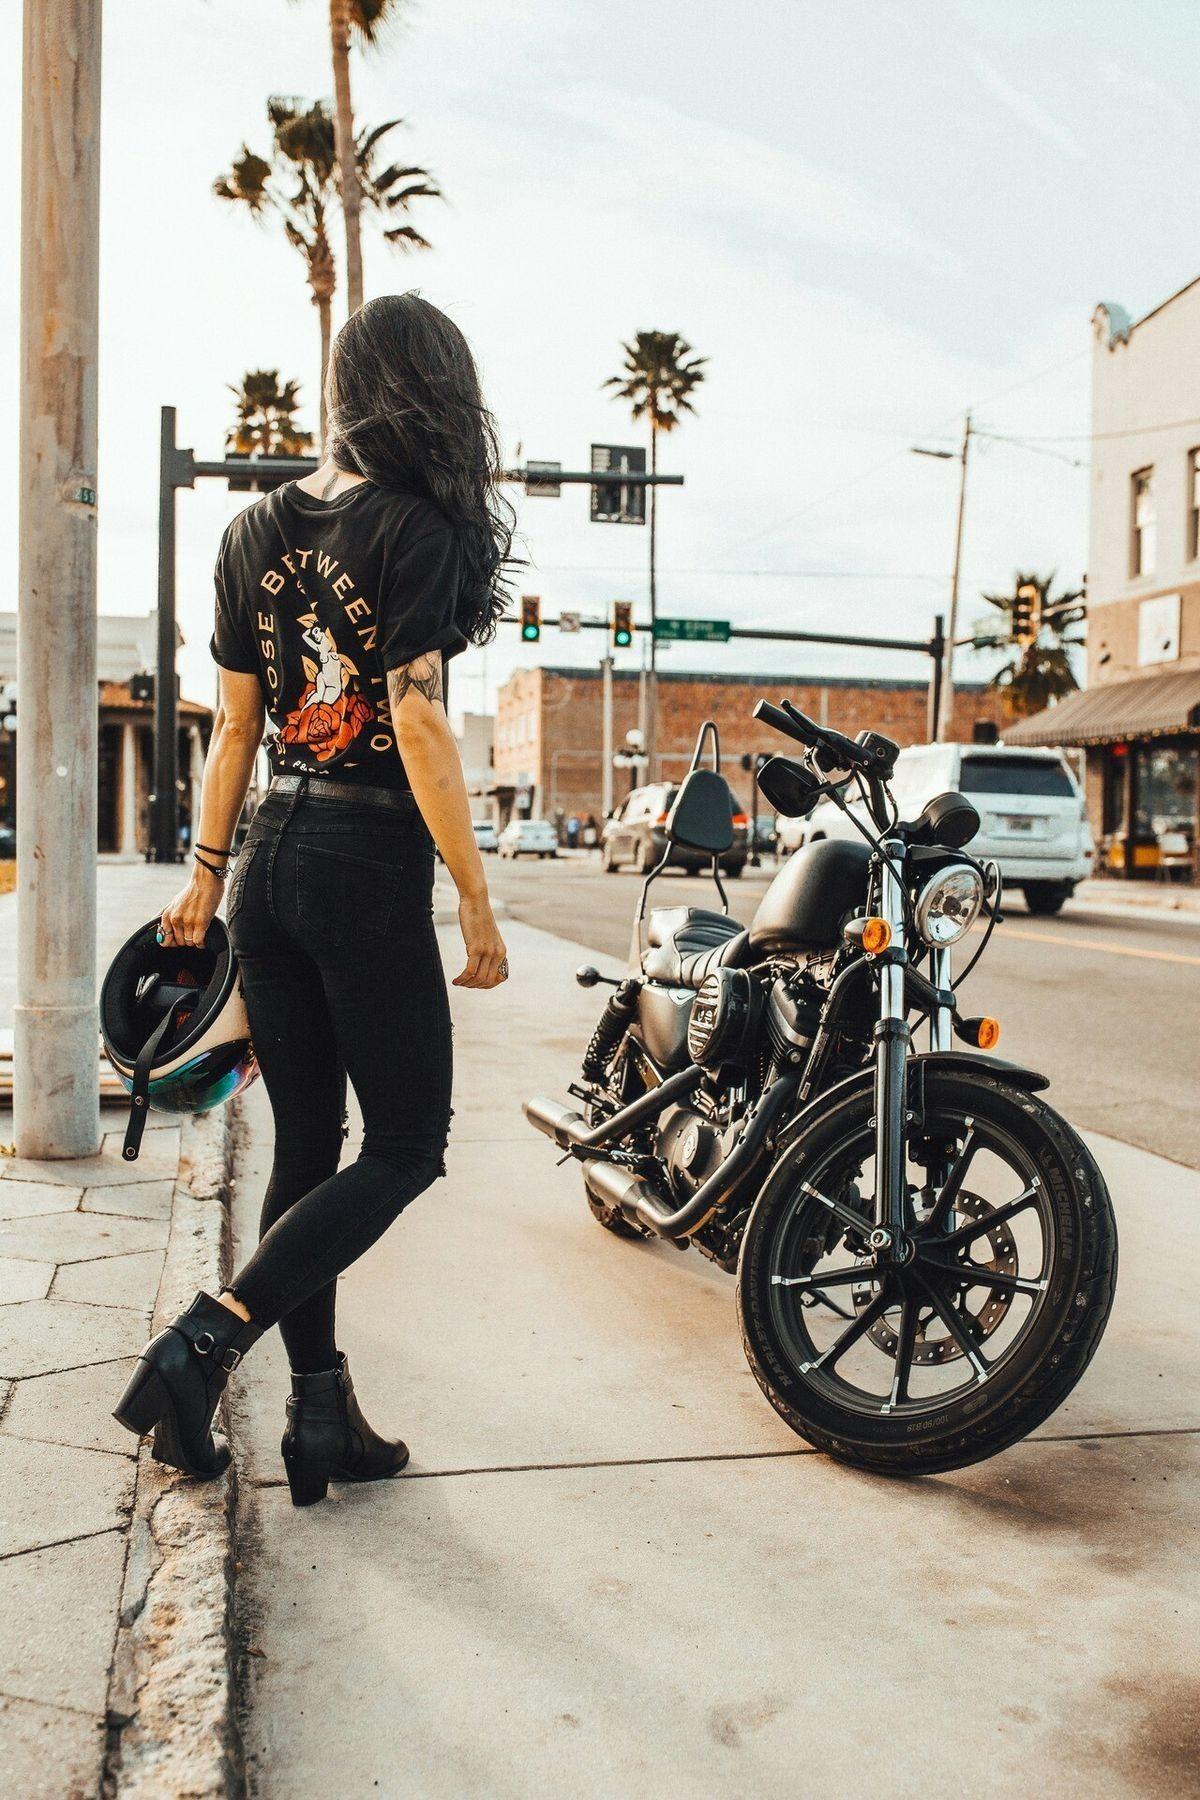 2005 Harley-Davidson Dyna #motorchick #motorbike #motorcycle #motortrend